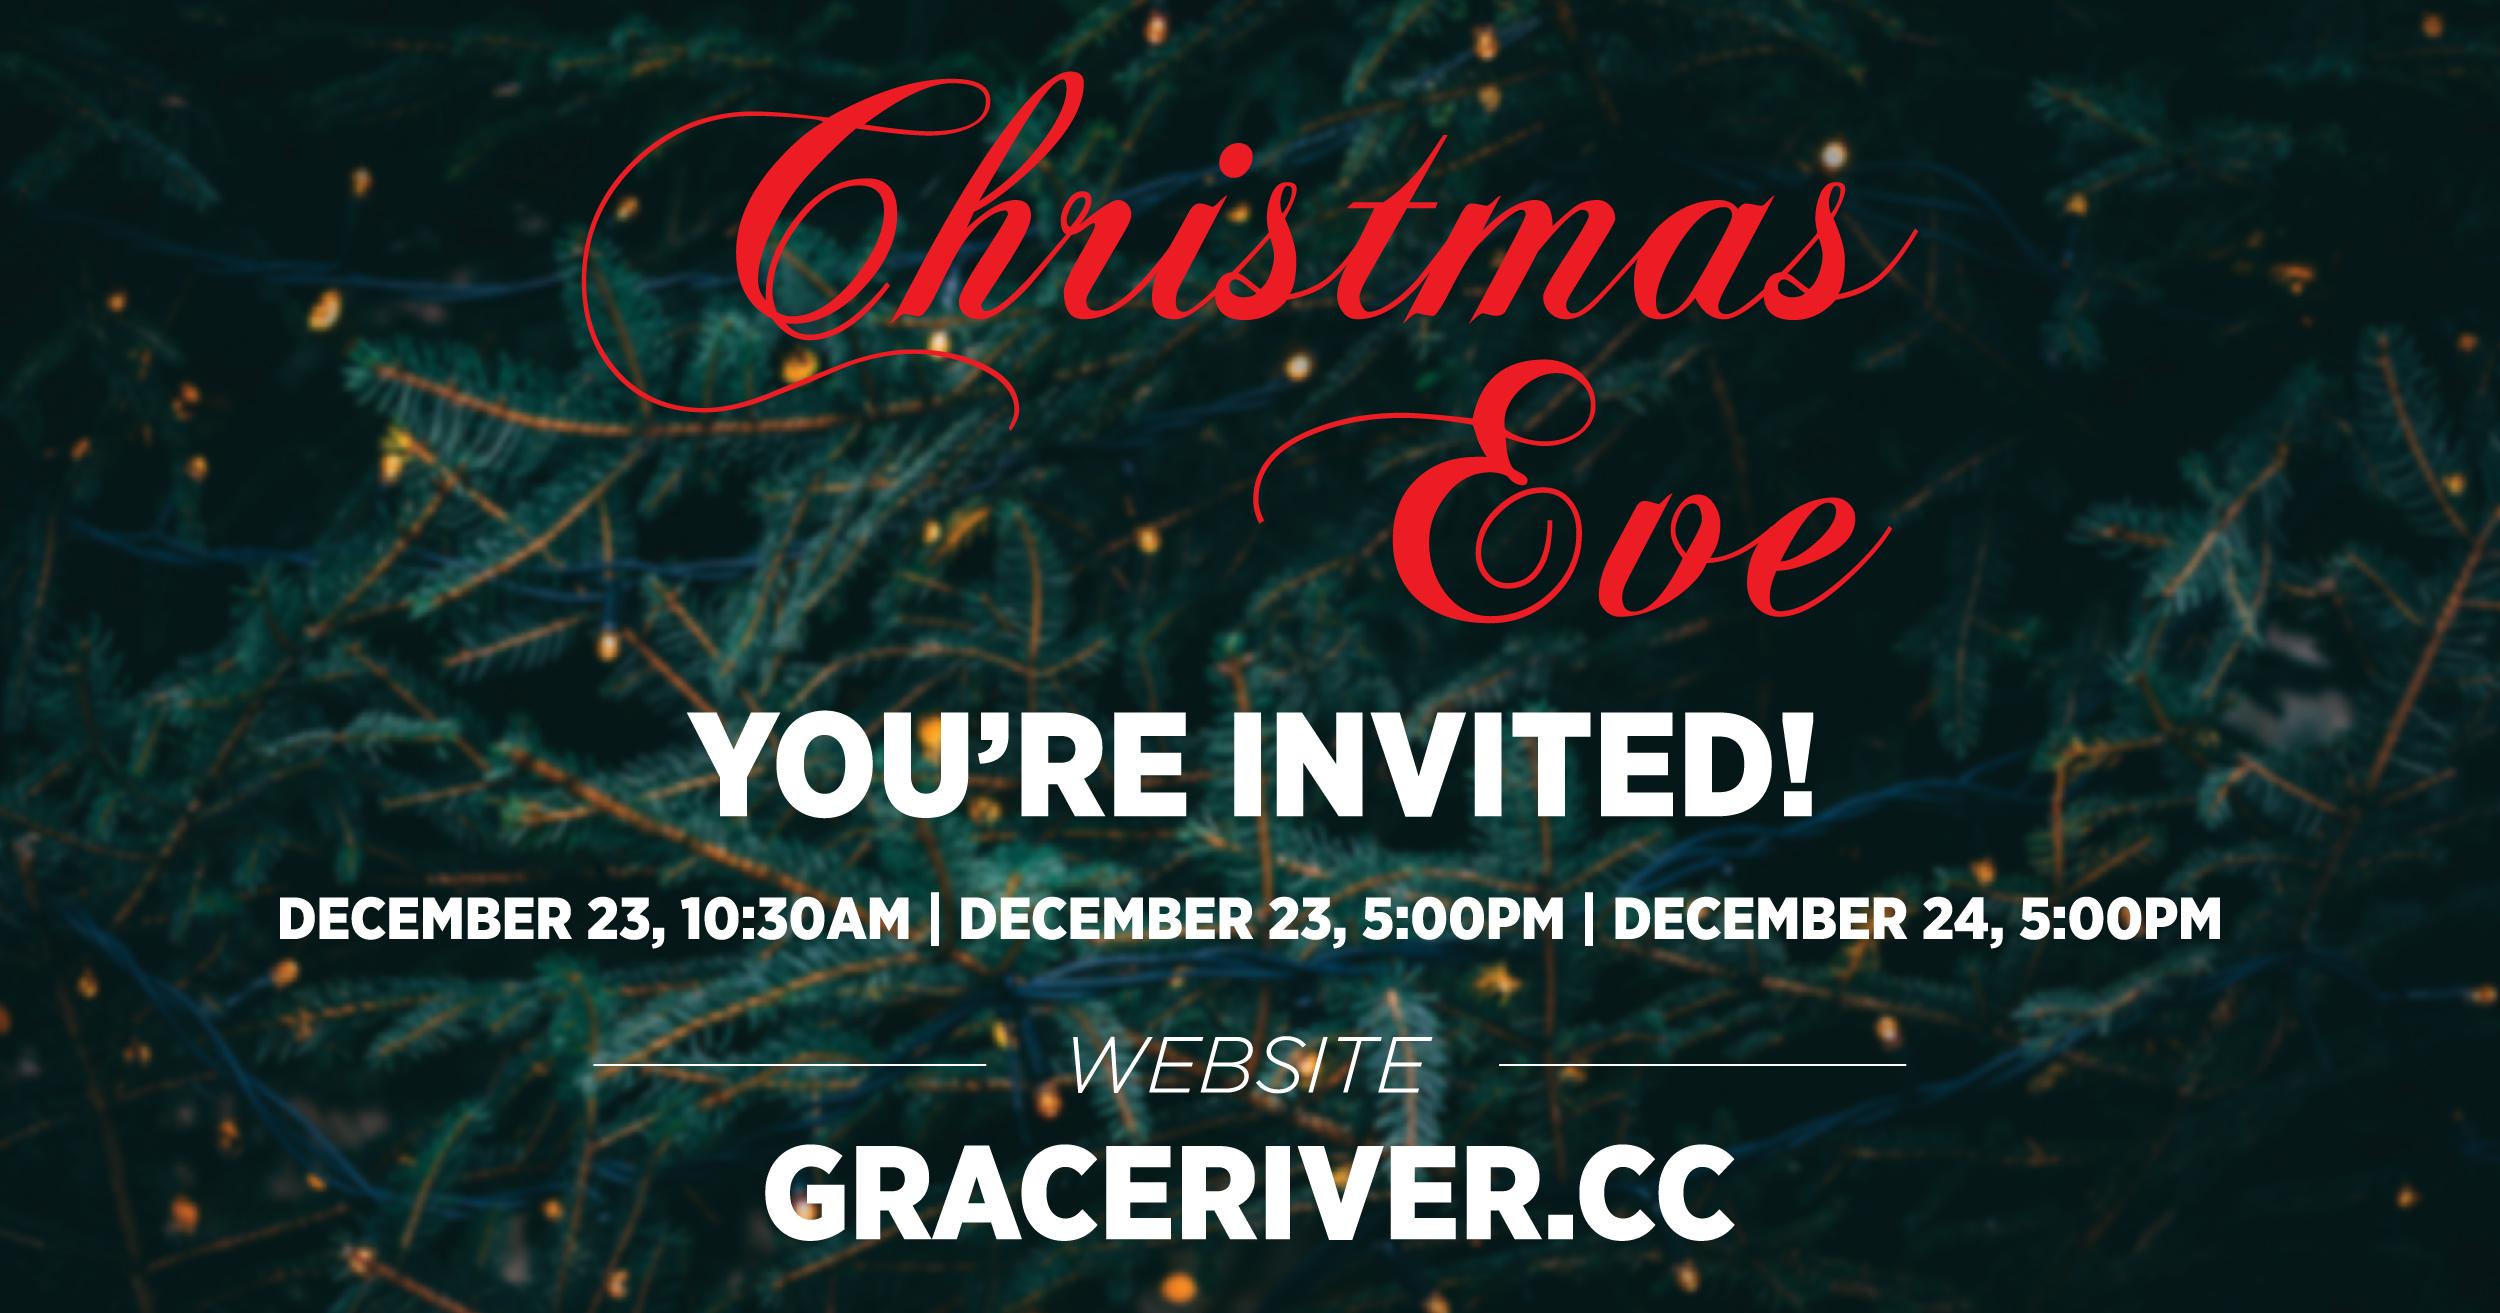 Christmas Eve Facebook-01.jpg